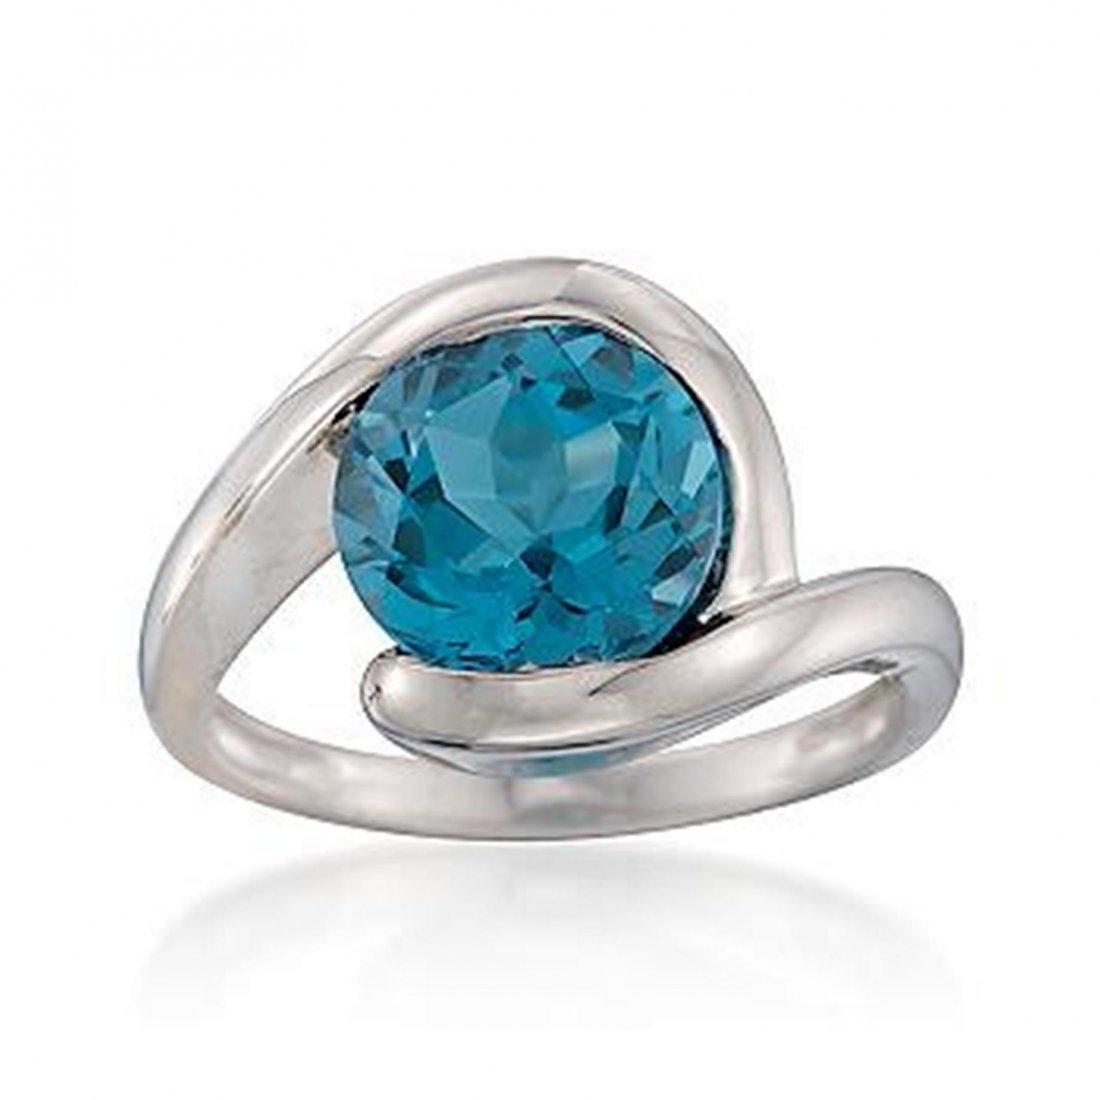 4.20 Carat London Blue Topaz Ring in Sterling Silver